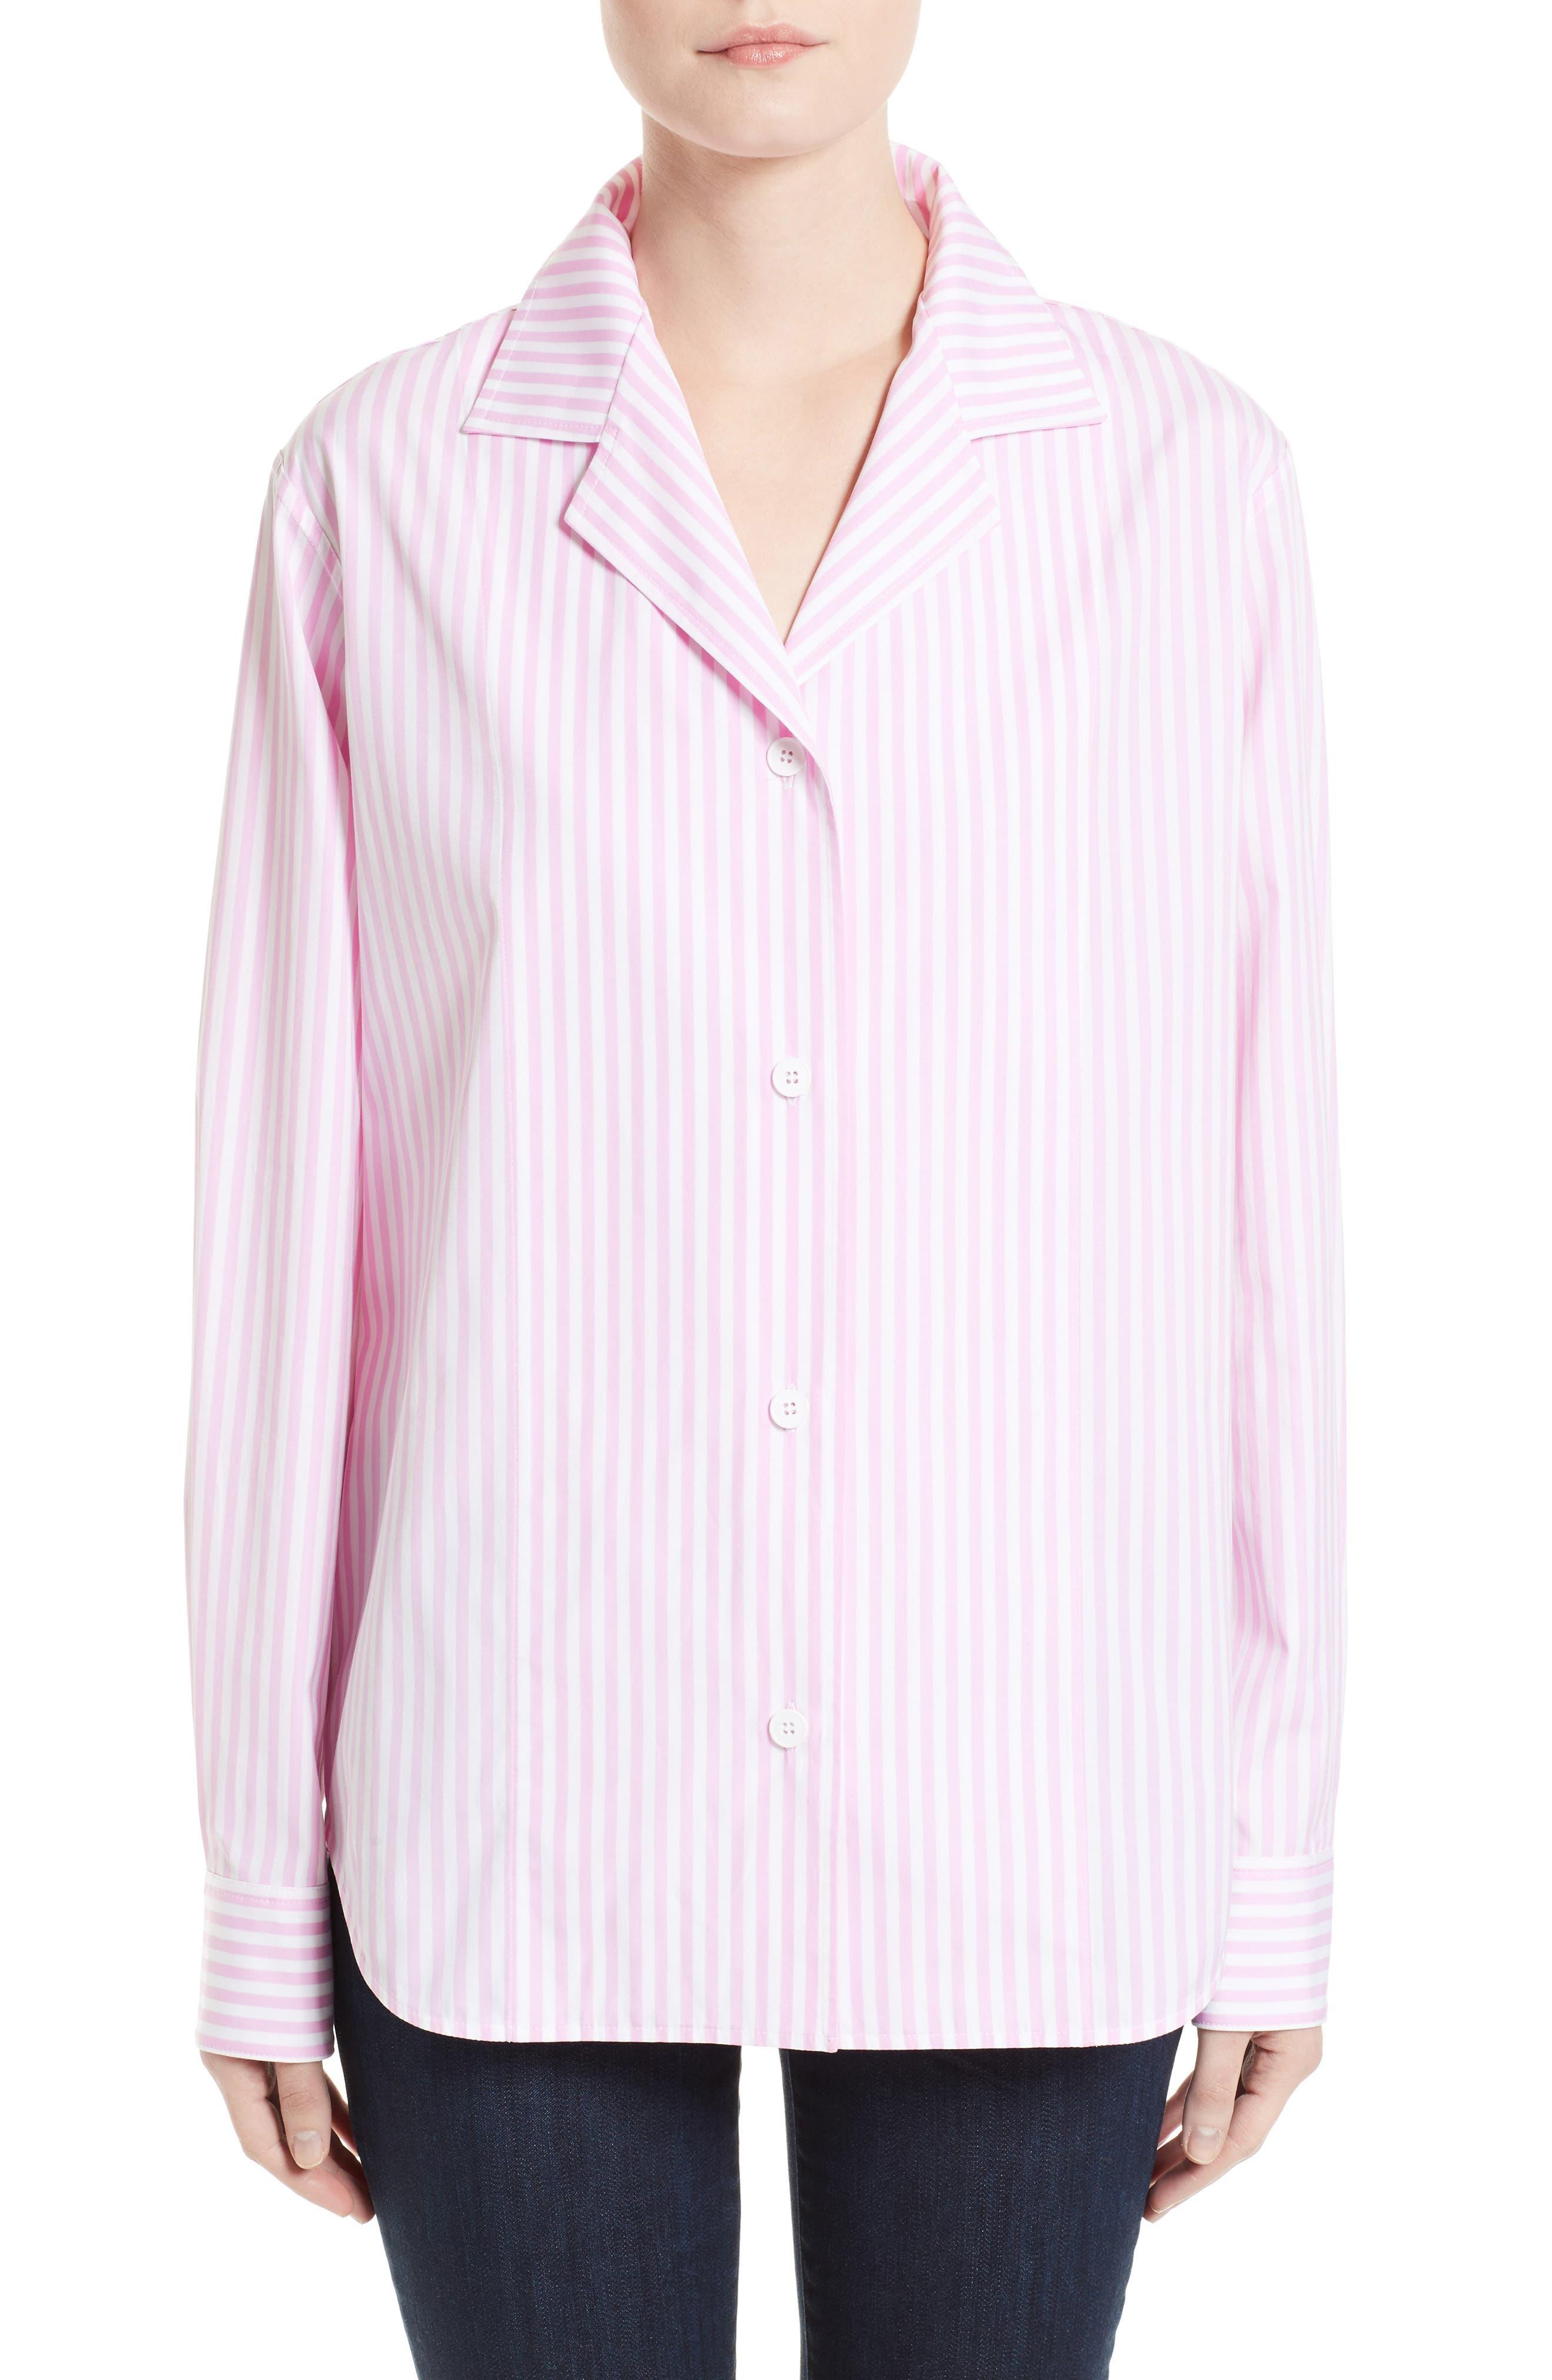 Cotton Grandad Shirt,                             Main thumbnail 1, color,                             650